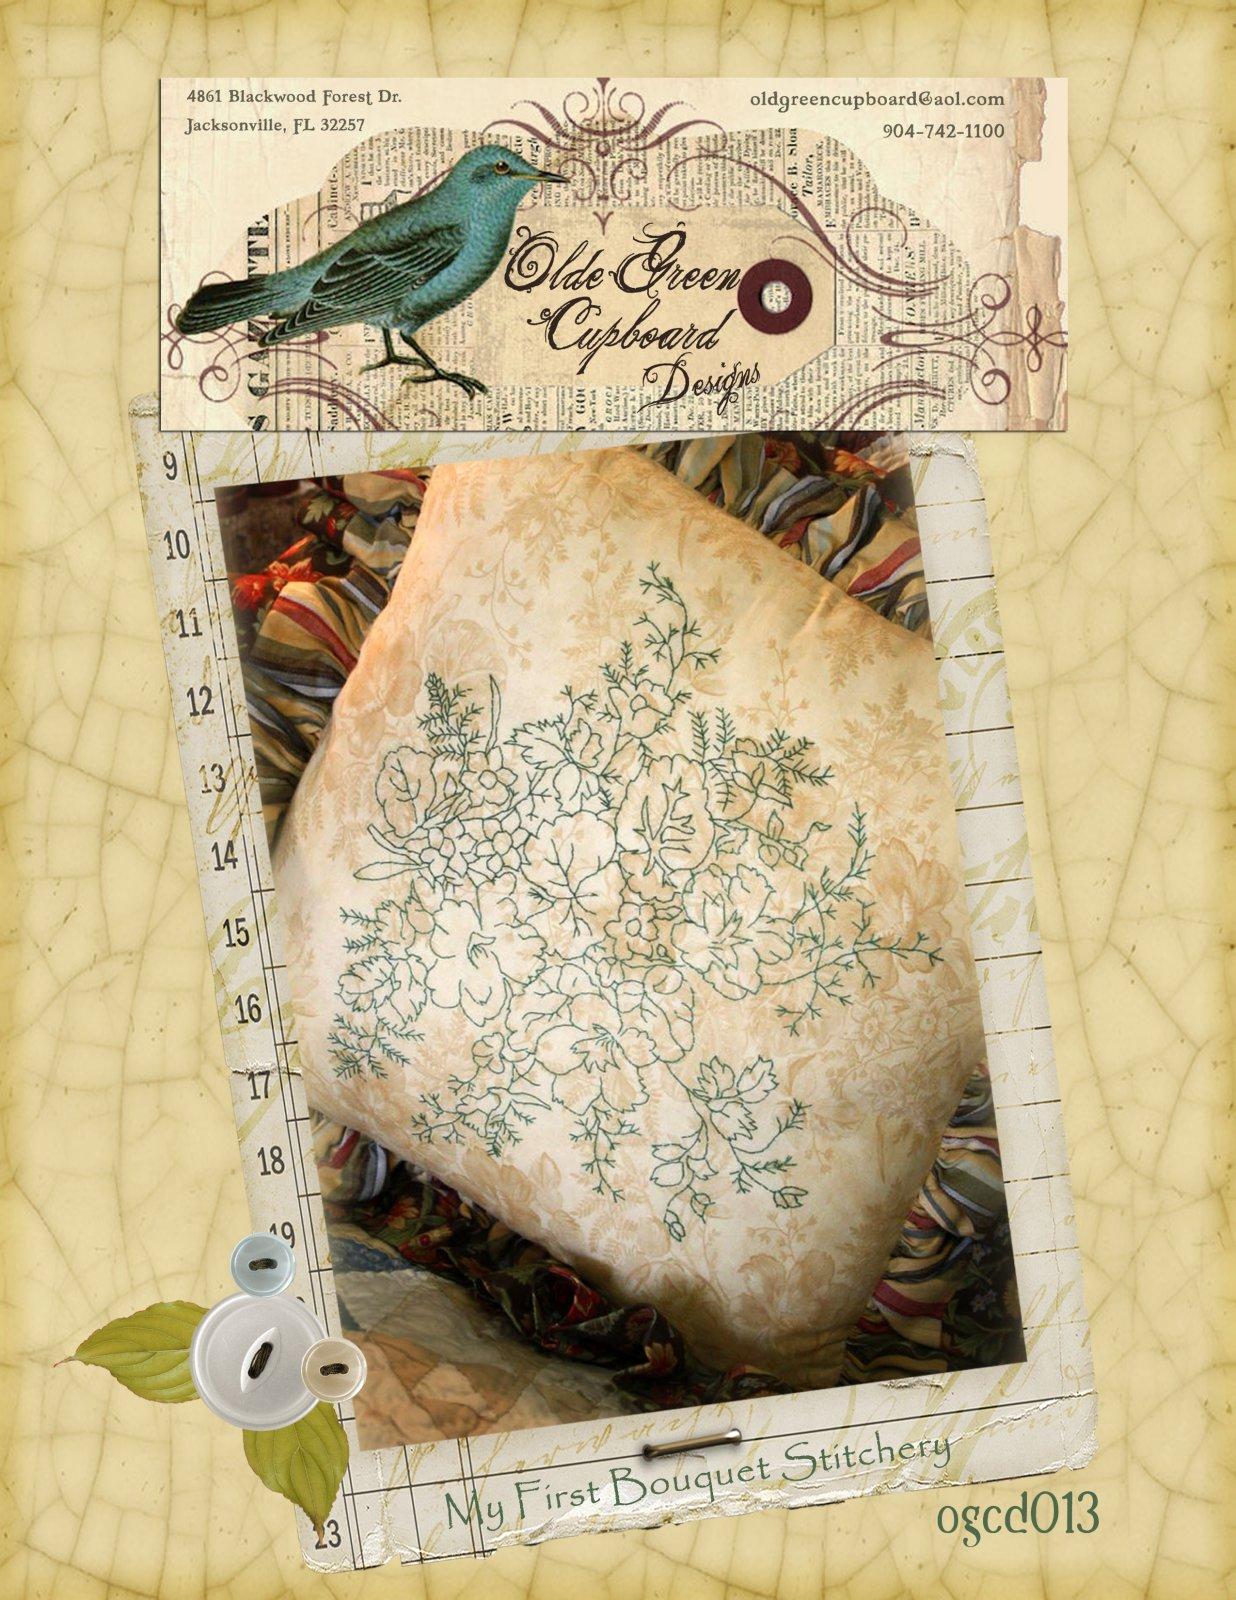 My First Bouquet Stitchery Pattern - OGCD013